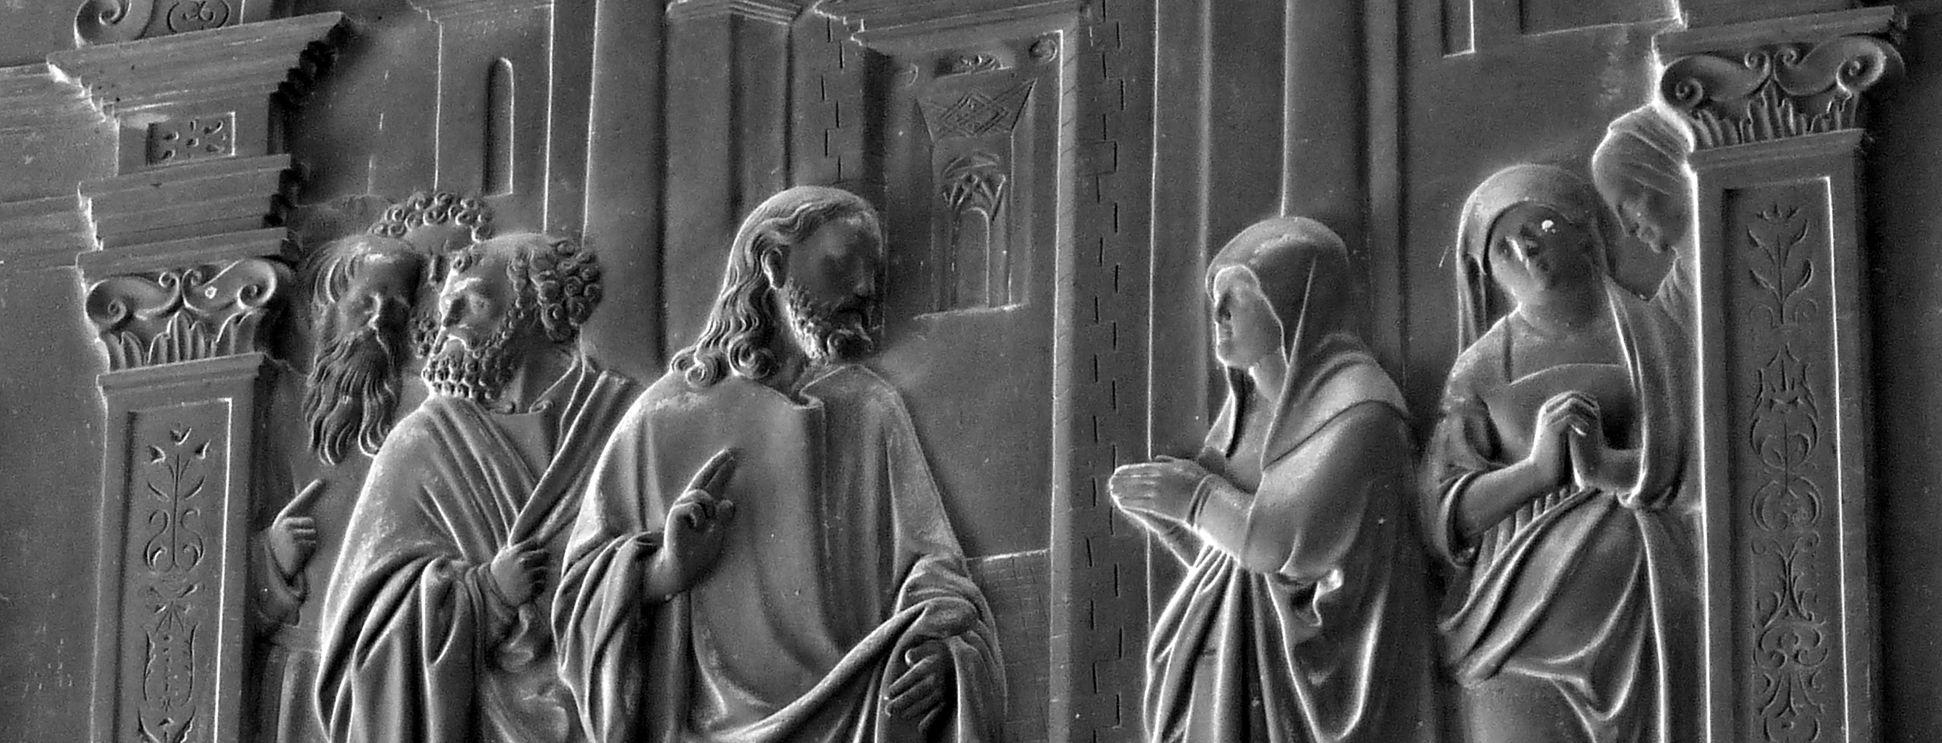 Die Kanaanäische Frau mittleres Bildfeld